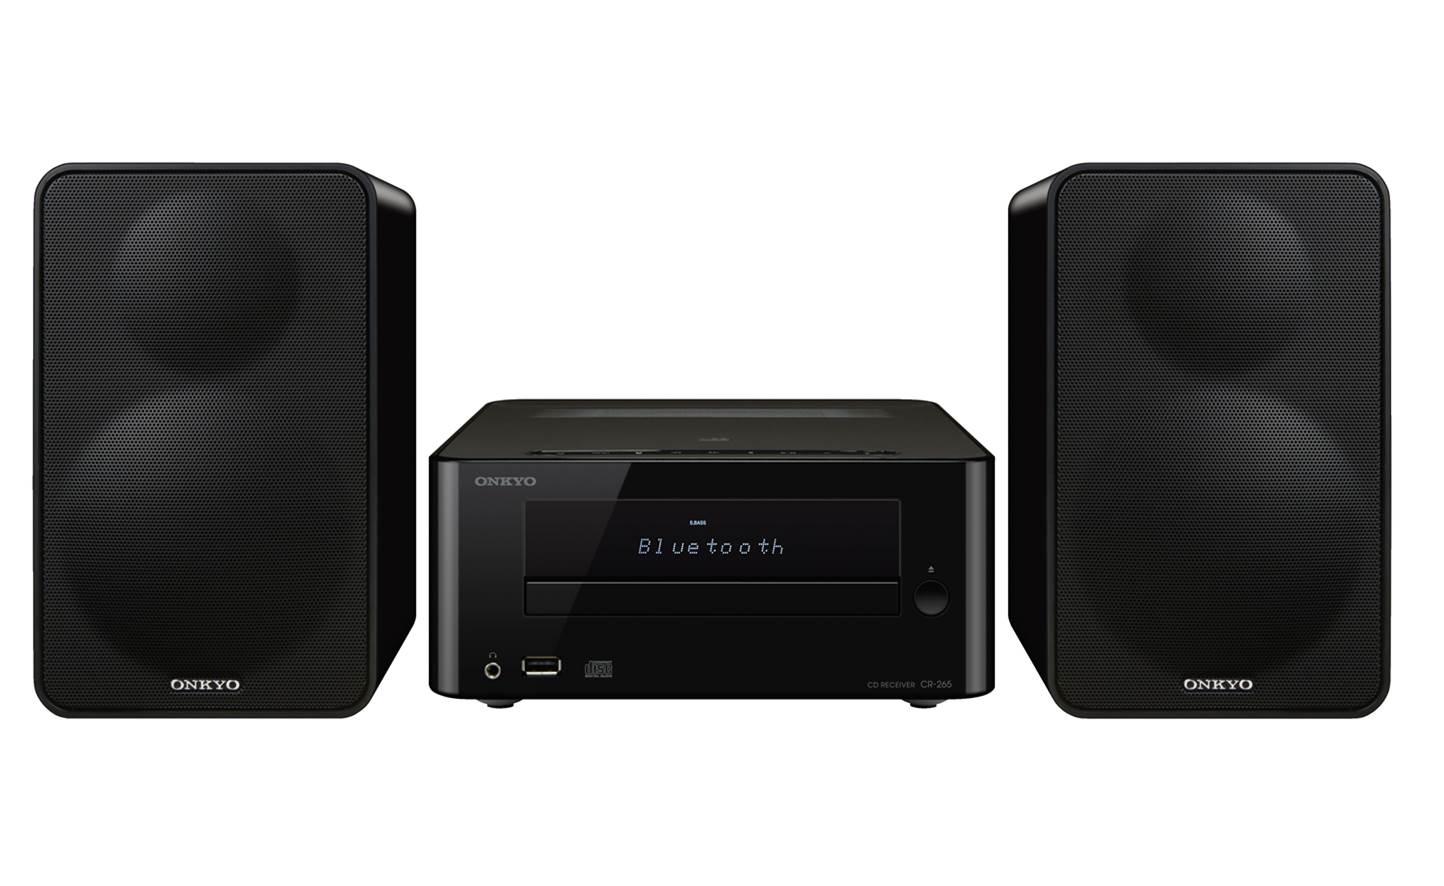 Onkyo CS-265 Home Stereo System